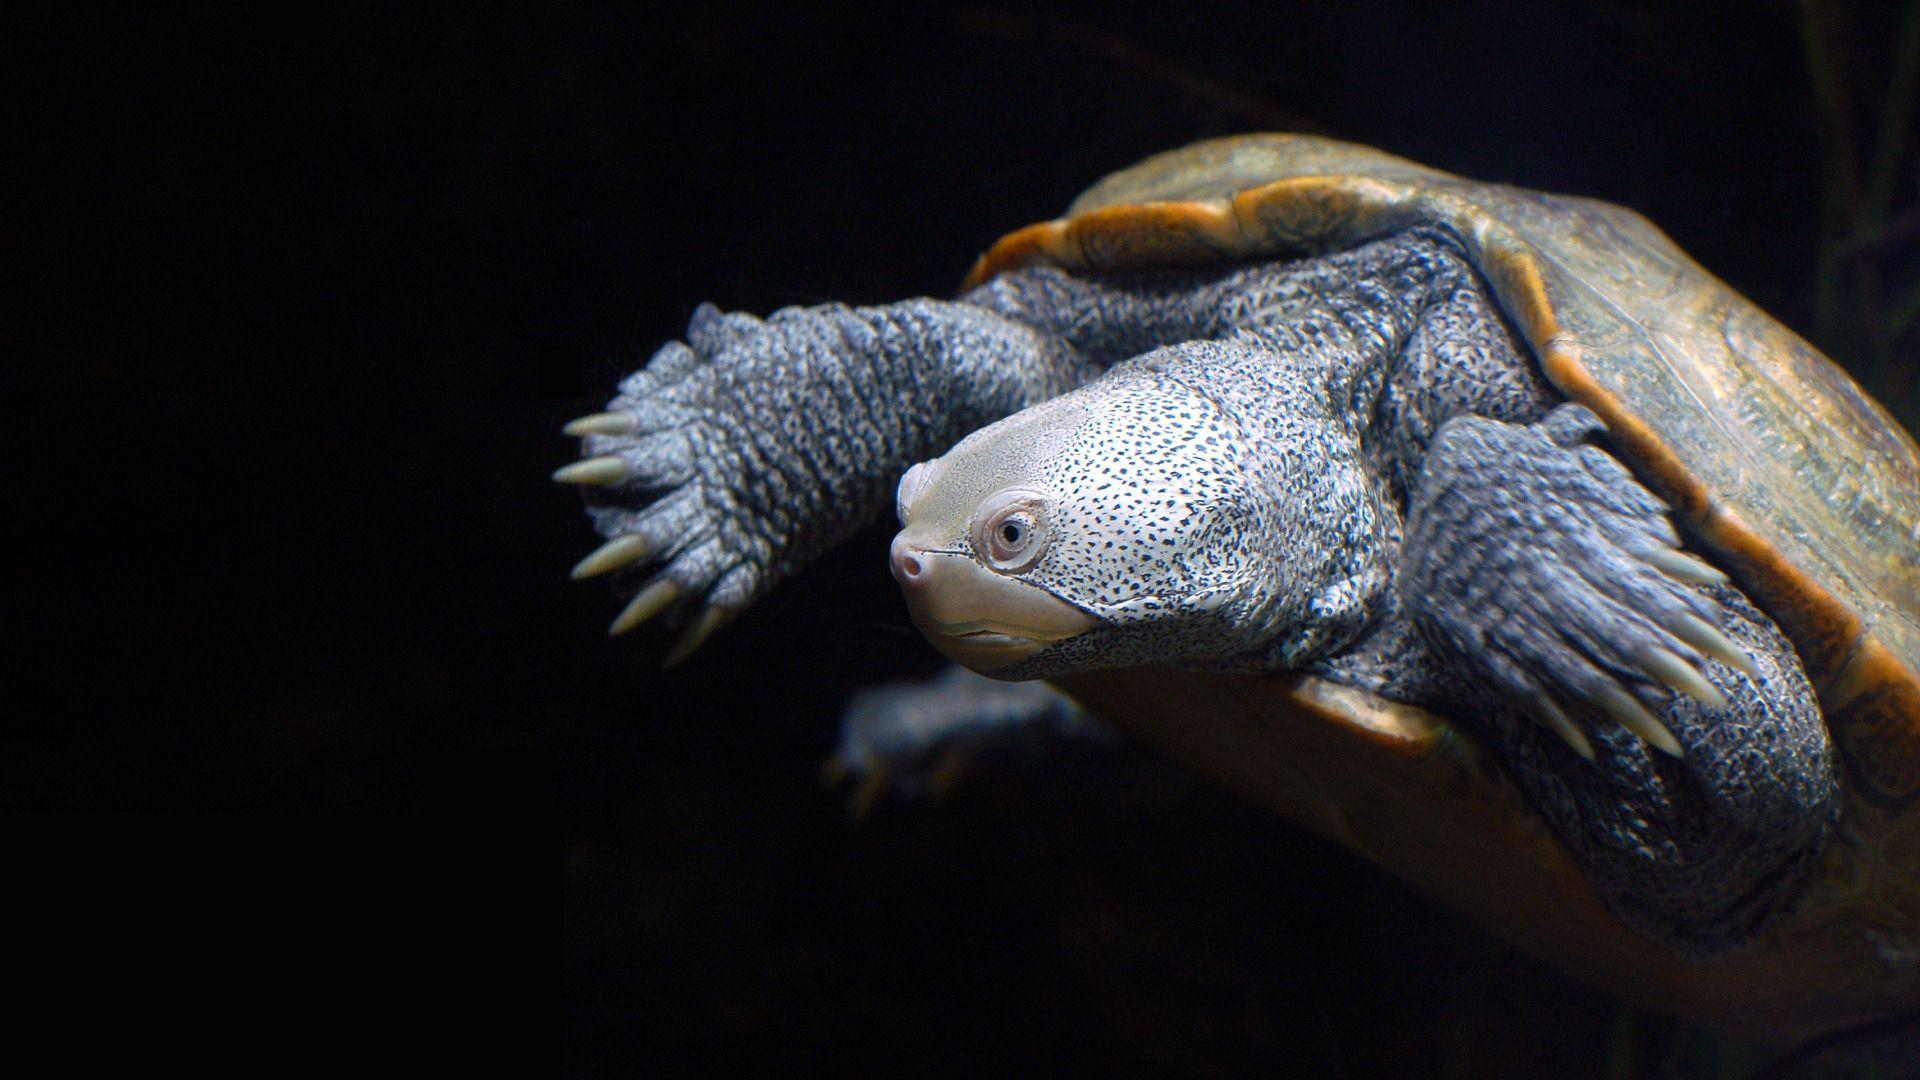 Turtle On Black Background